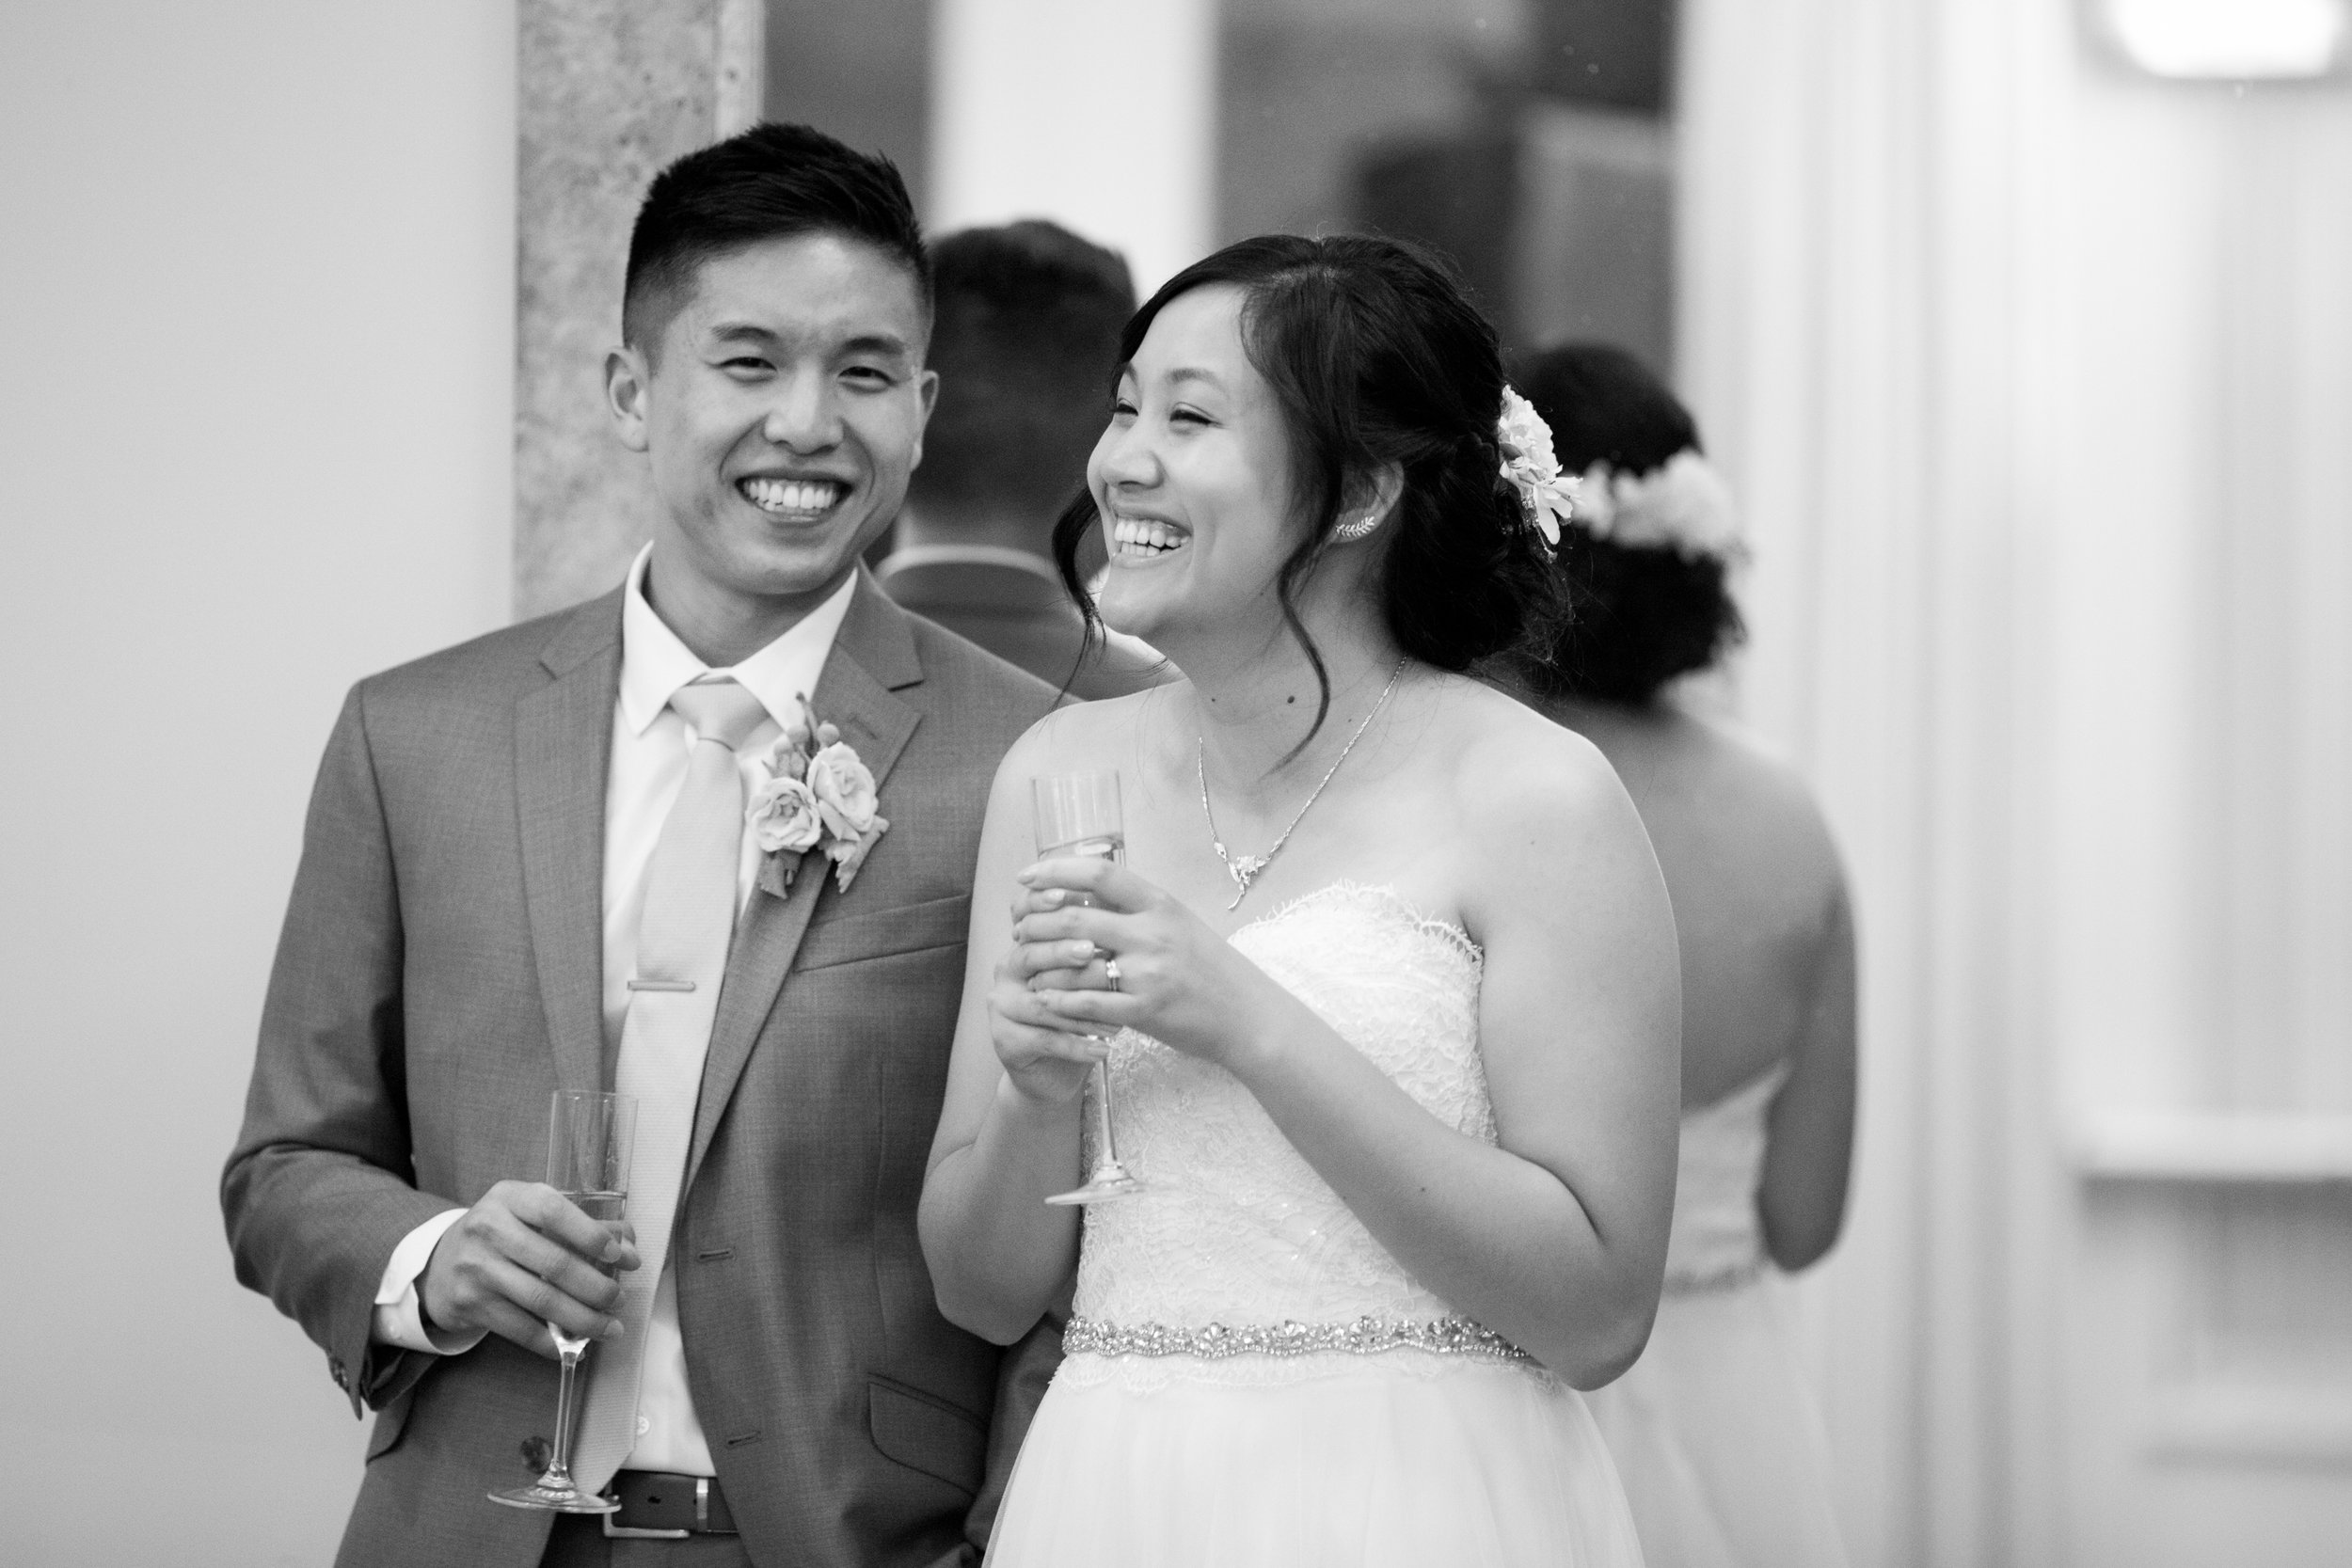 trynhphoto_wedding_photography_Standford_PaloAlto_SF_BayArea_Destination_OC_HA-474.jpg